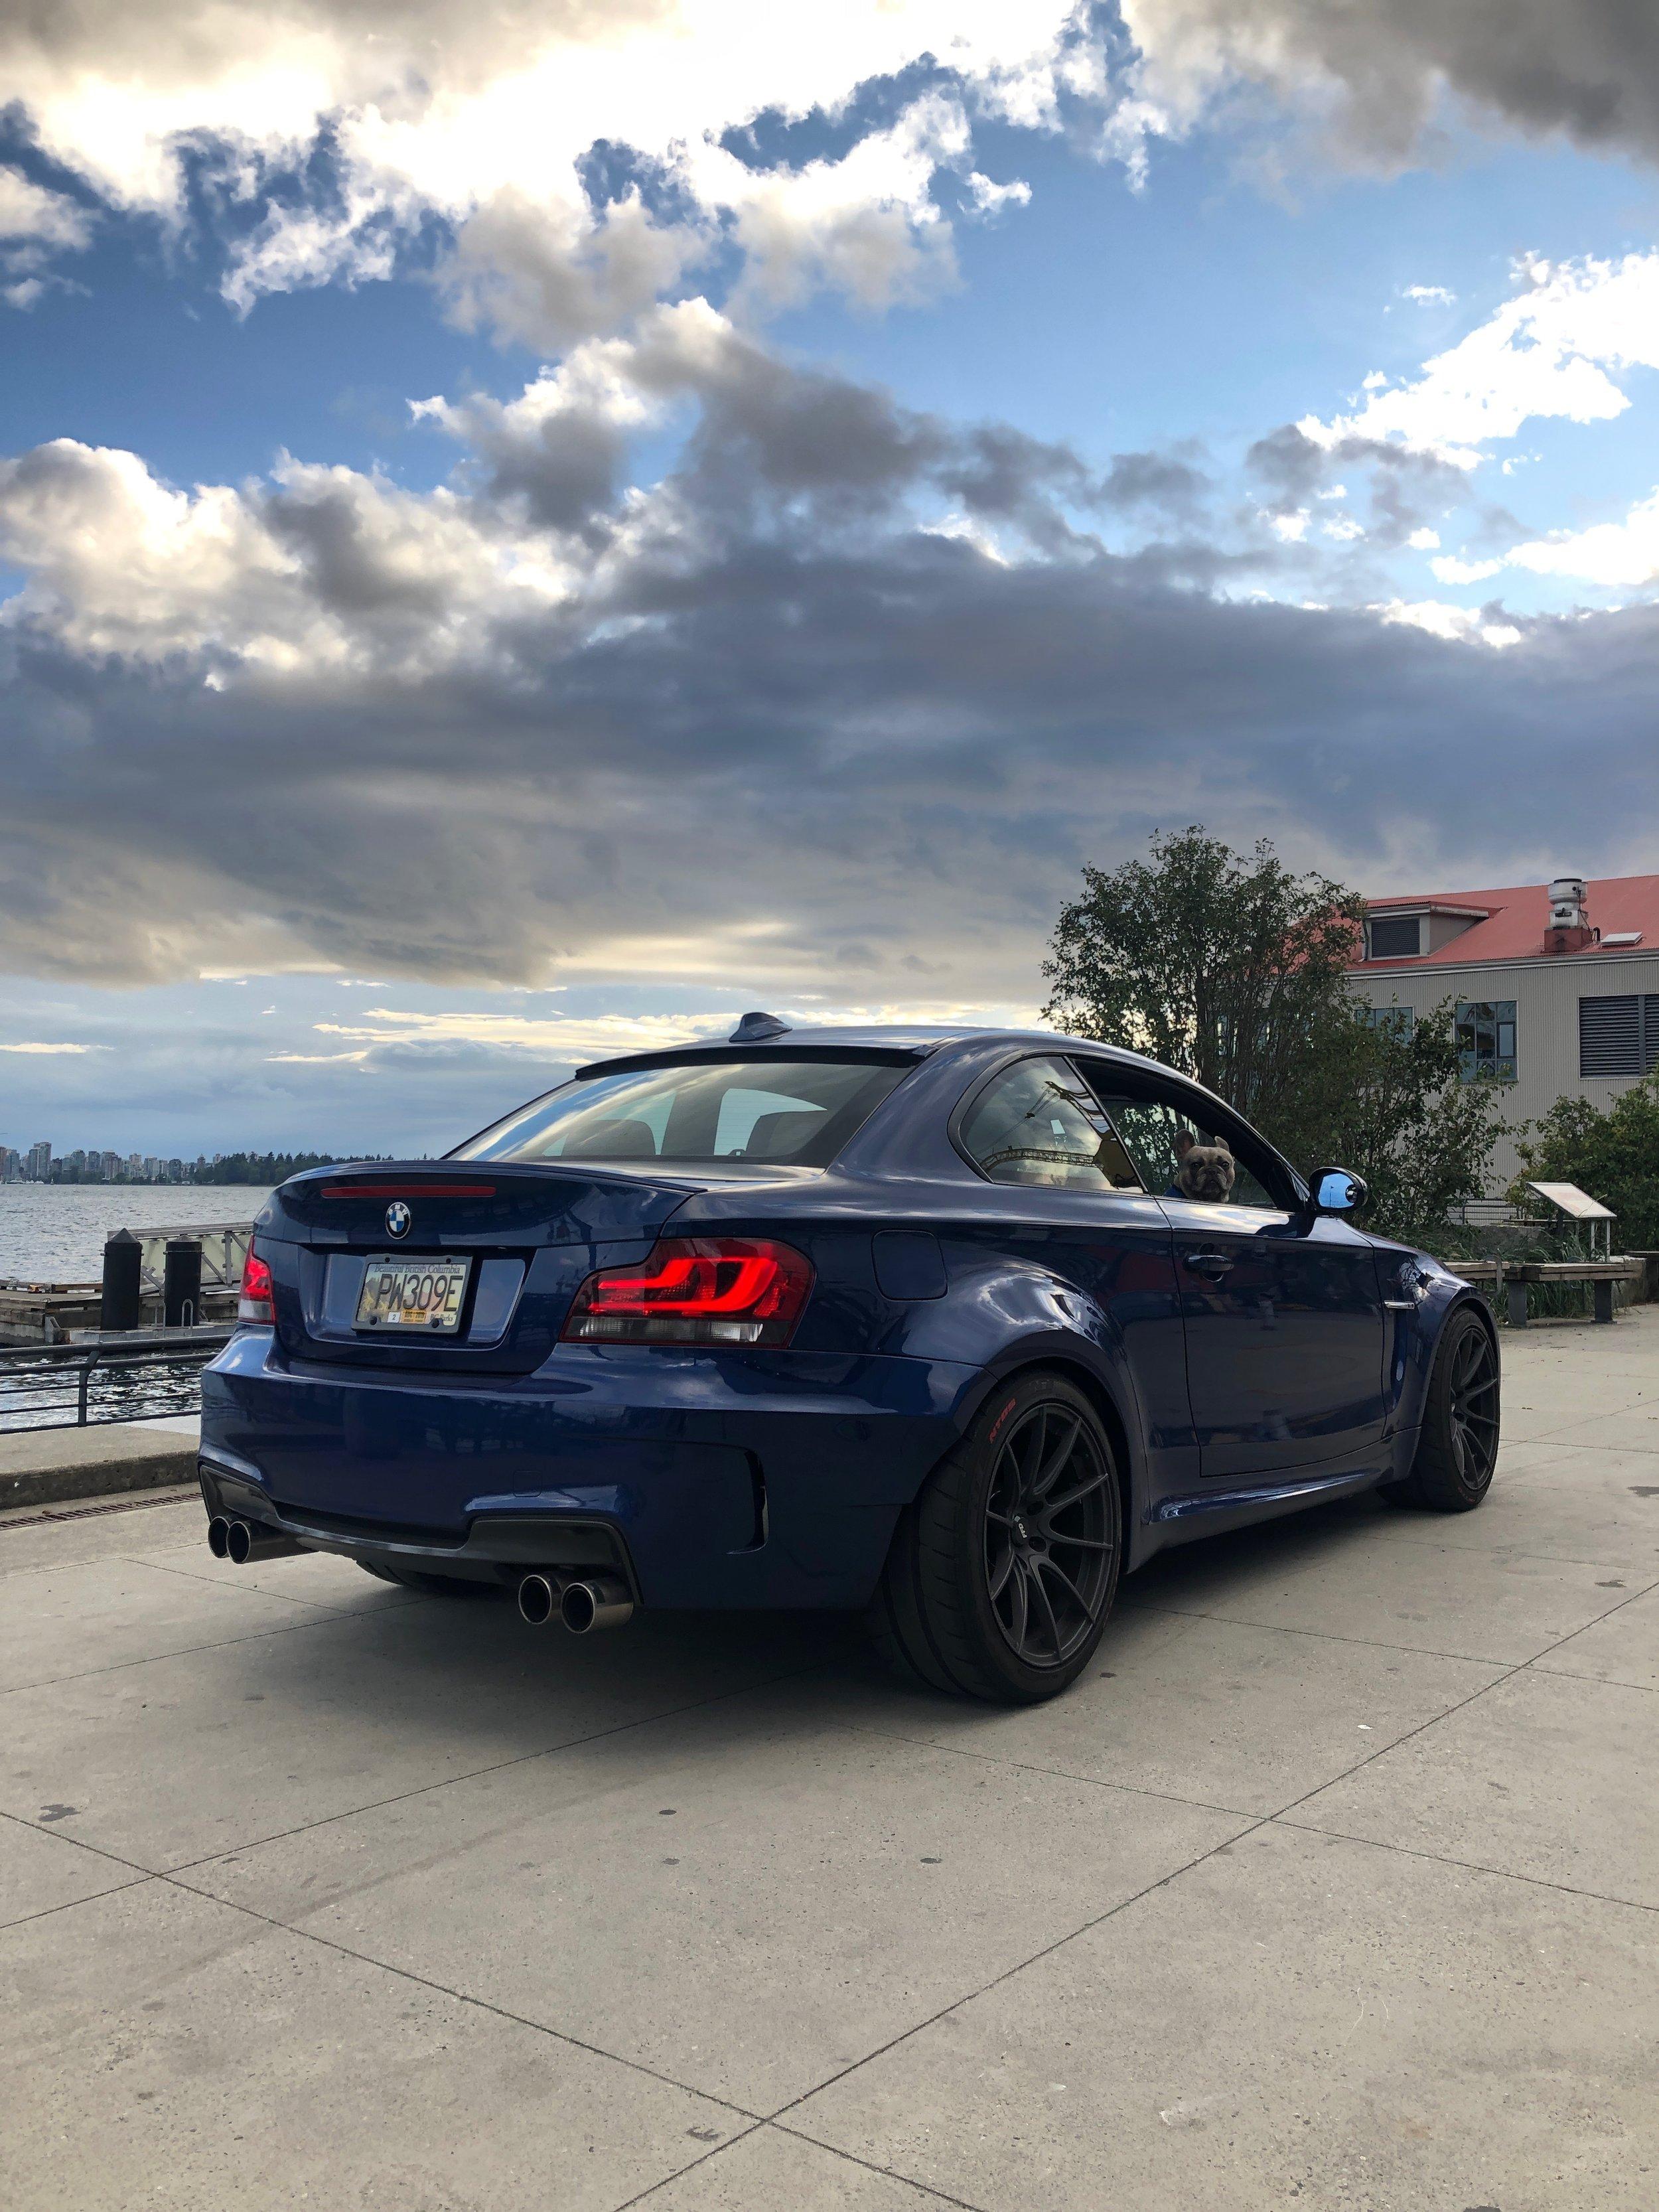 BMW 1M Wide Body Finished